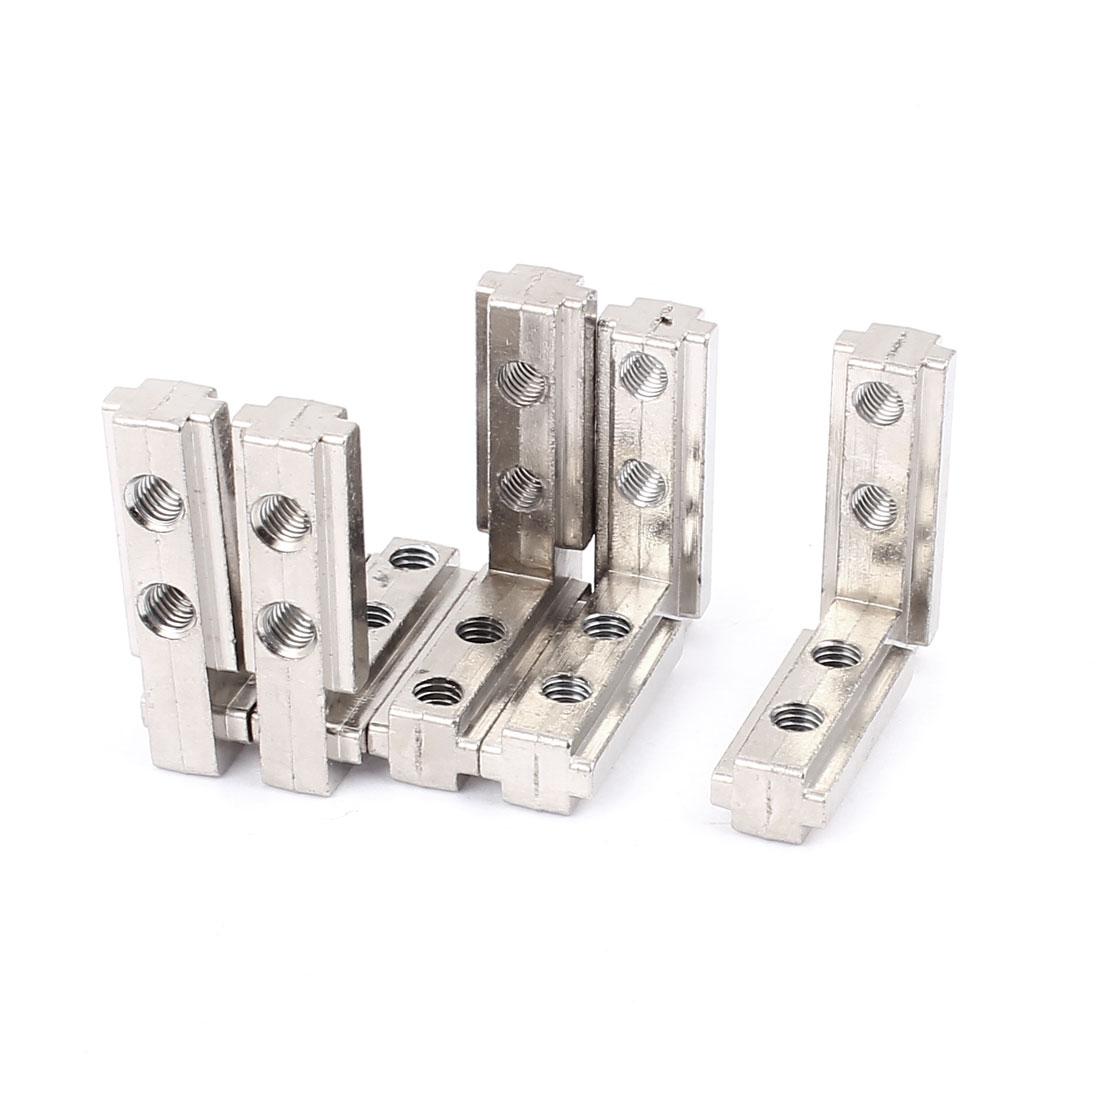 44mm x 40mm x 13mm 90 Degree Metal T Slot Corner Connector Silver Tone 5pcs